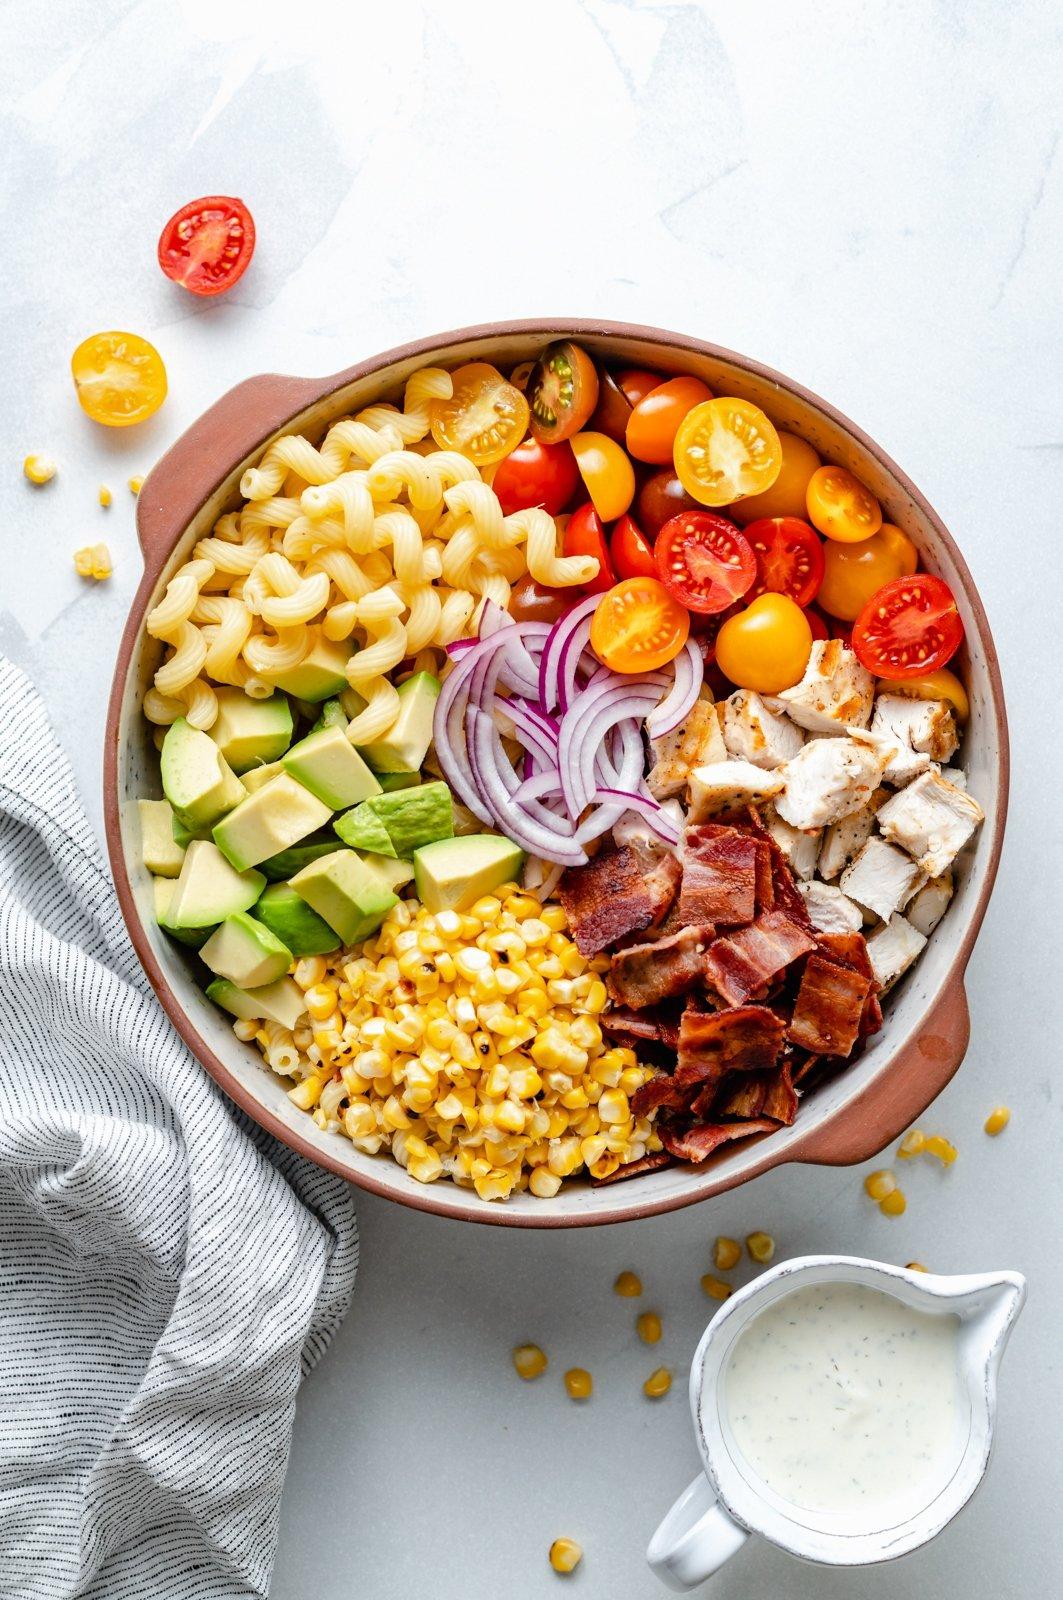 chicken bacon ranch pasta salad unmixed in a bowl